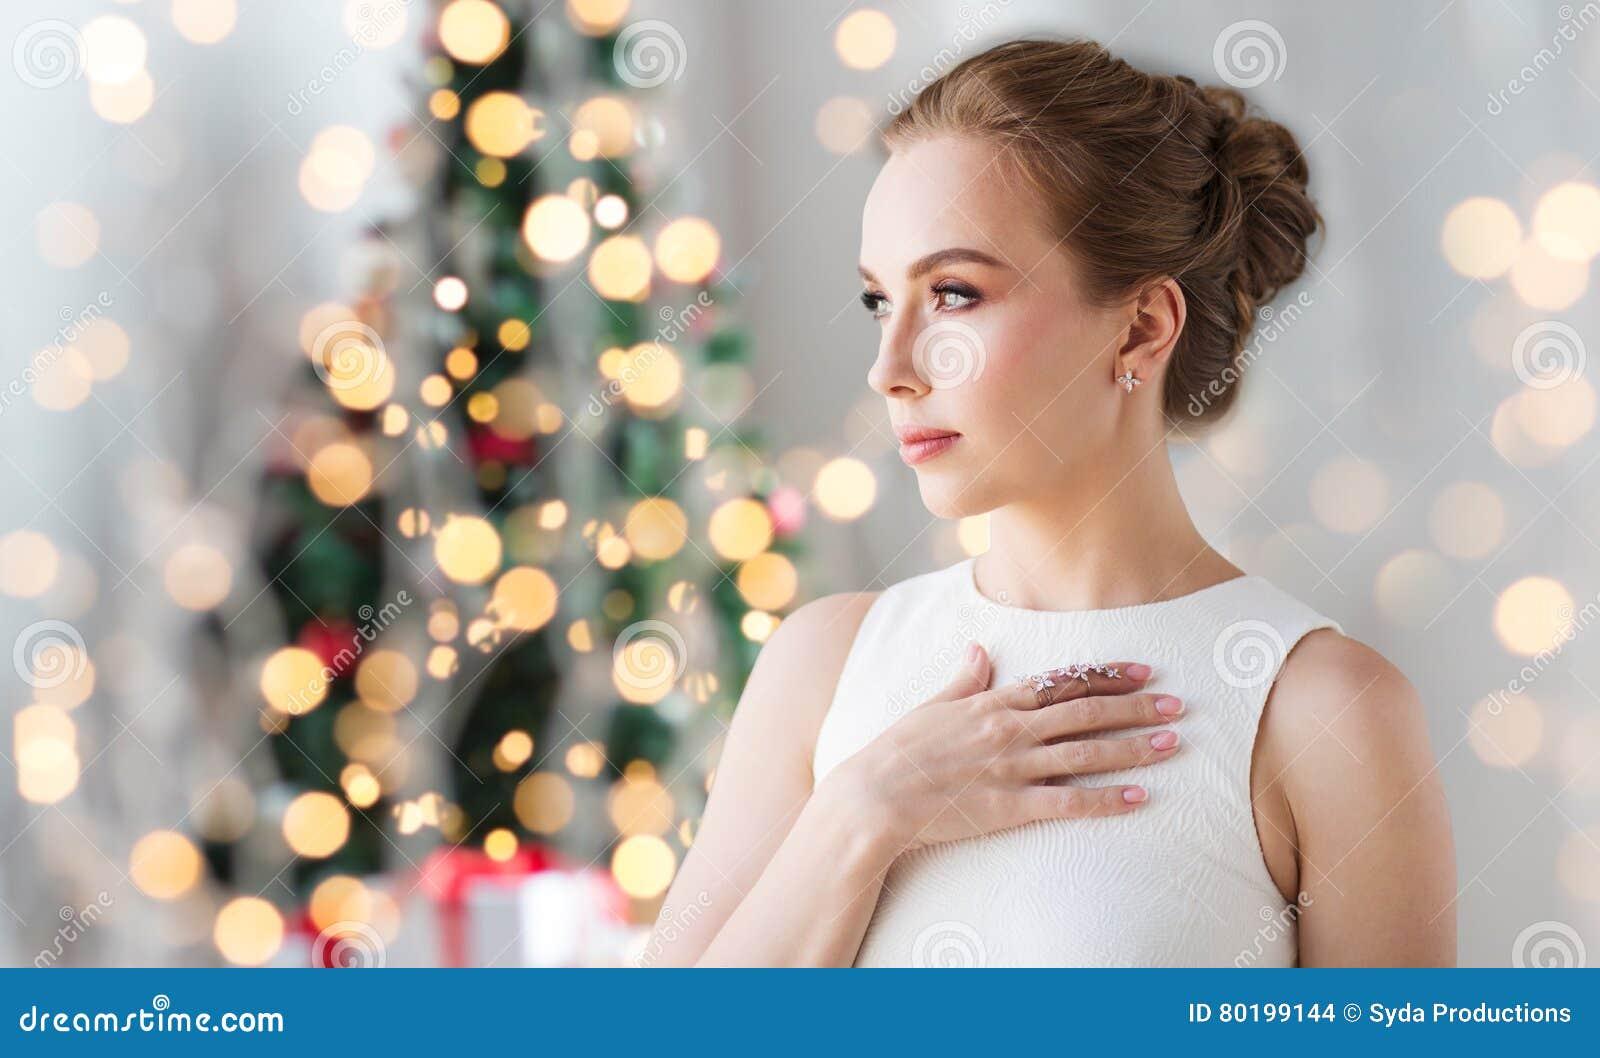 Woman Wearing Diamond Jewelry For Christmas Stock Photo - Image of ...